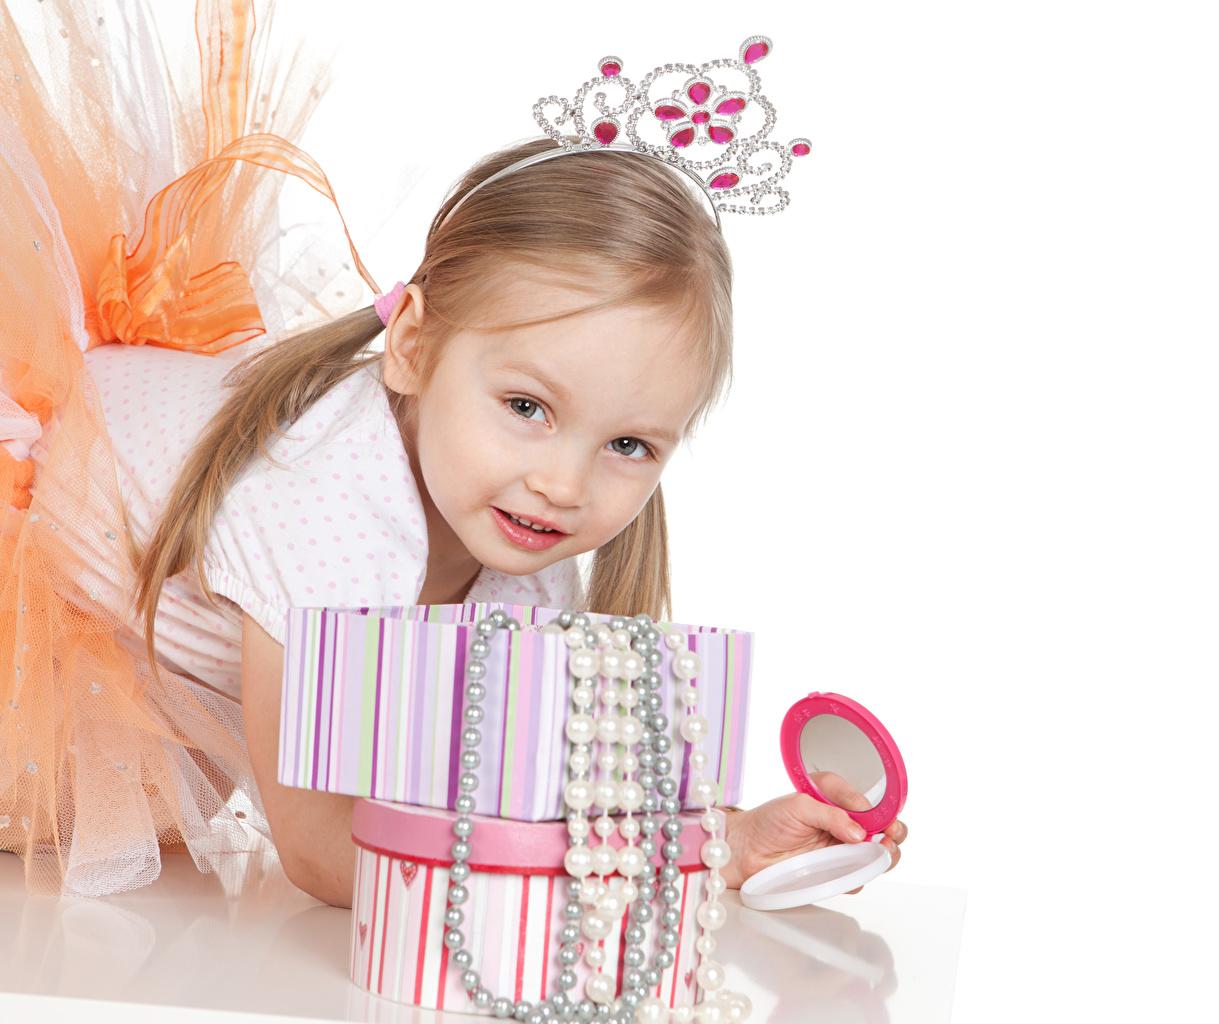 Images Little girls Crown Children Staring White background Jewelry child Glance